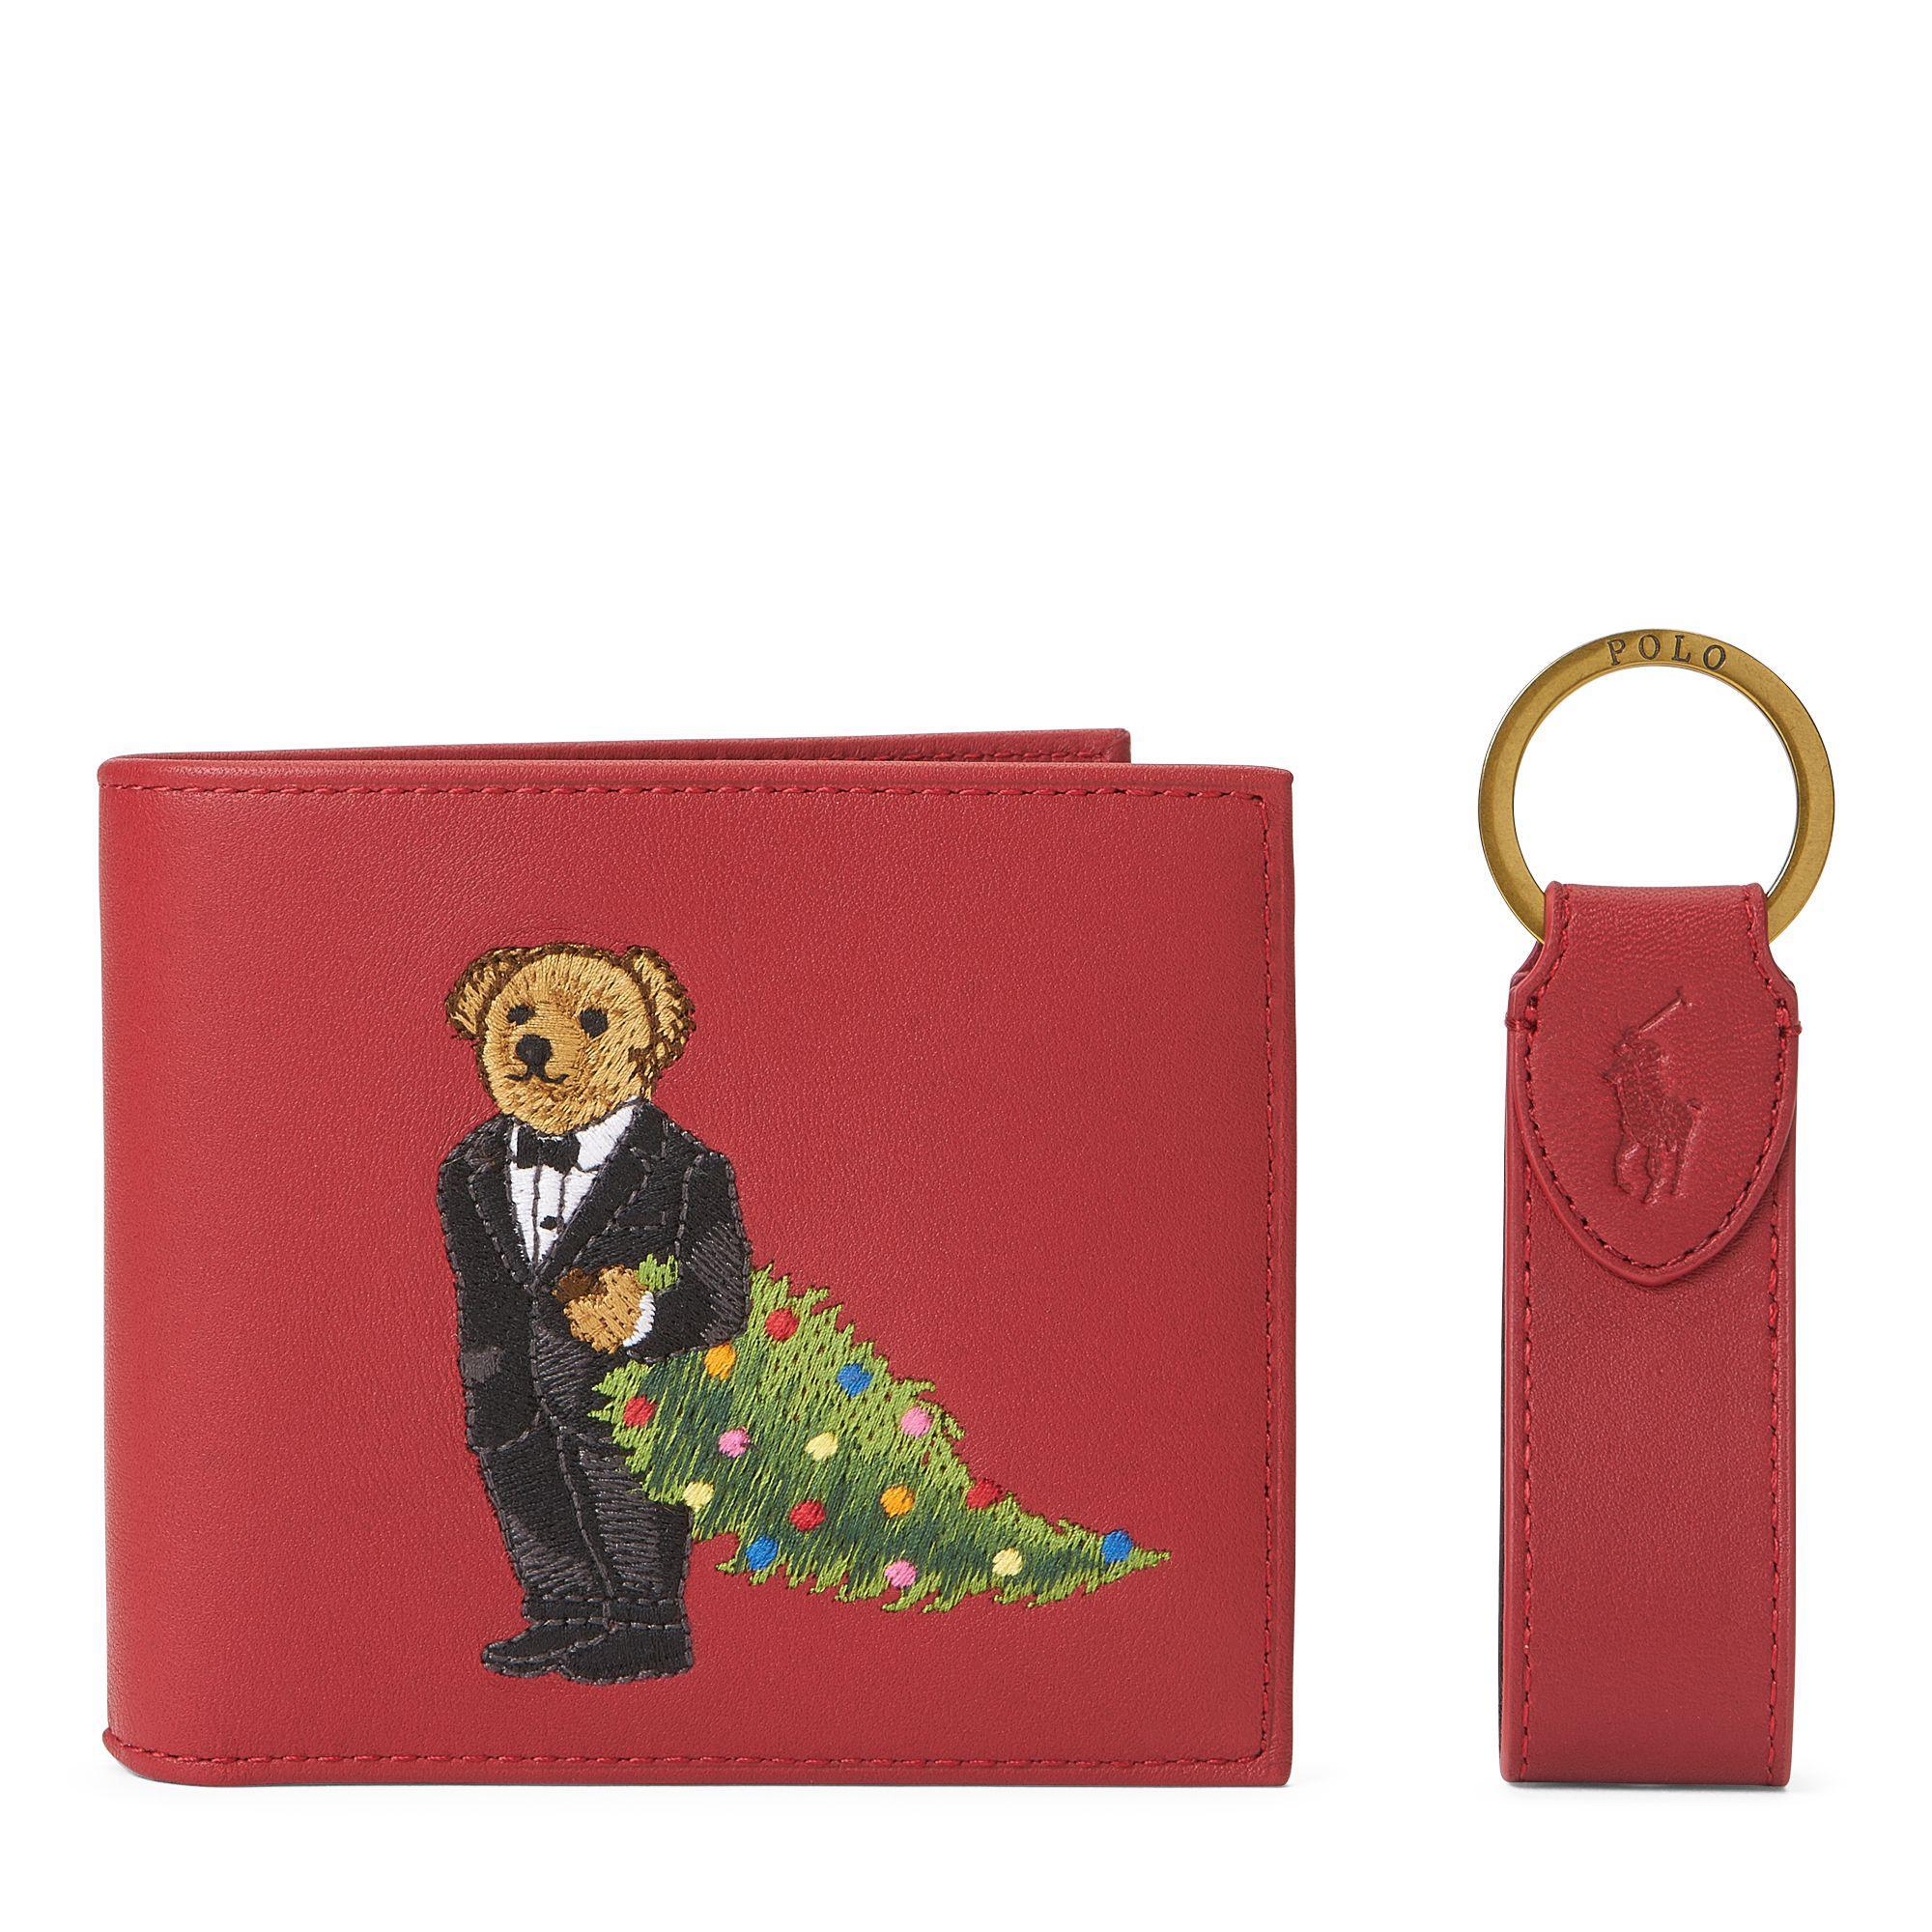 Polo Ralph Lauren Polo Bear Gift Set in Red for Men - Lyst 41dfe84b5c9e0